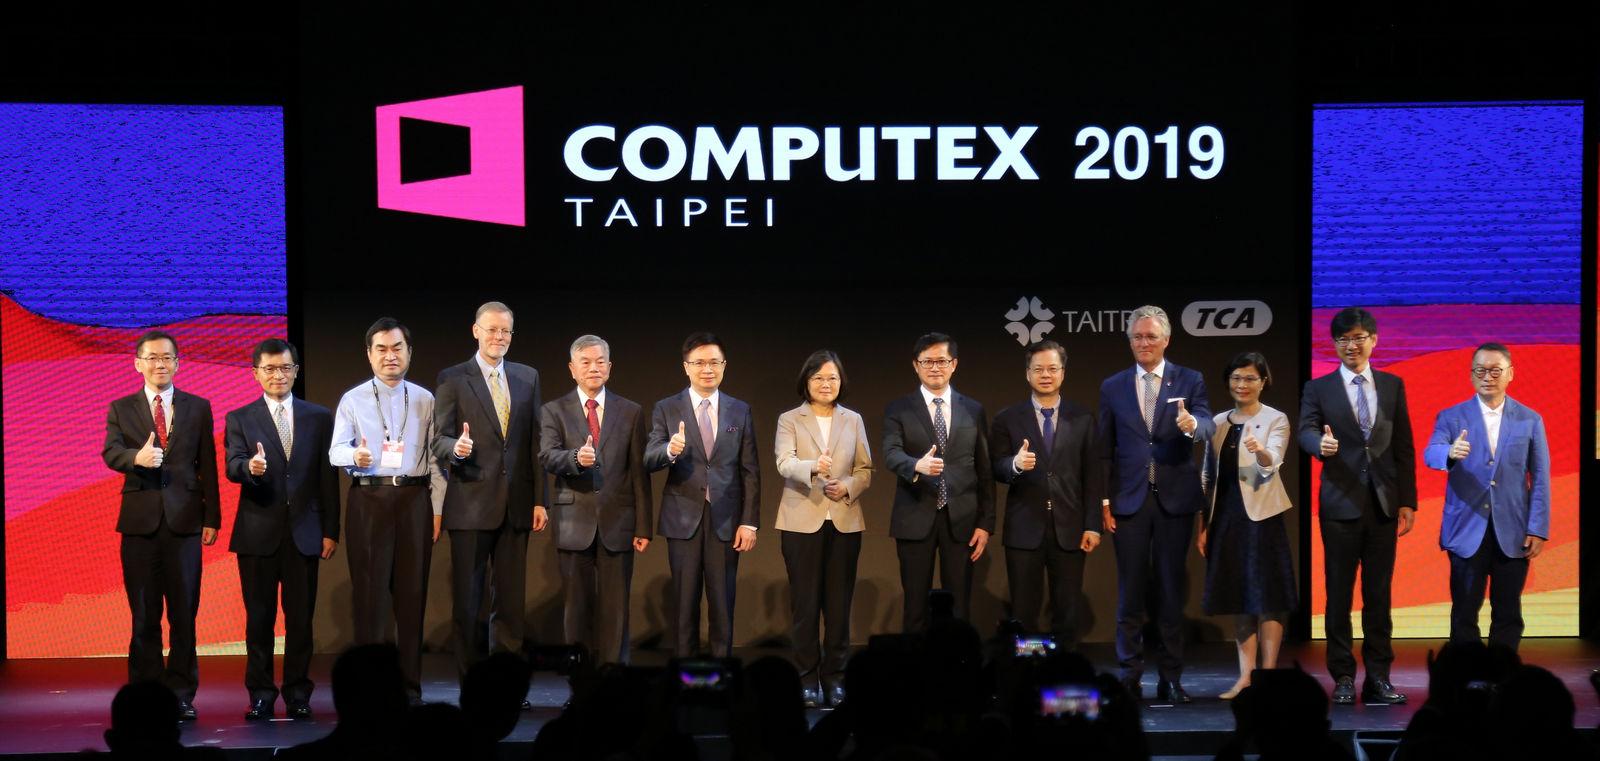 COMPUTEX TAIPEI - Building Global Technology Ecosystem